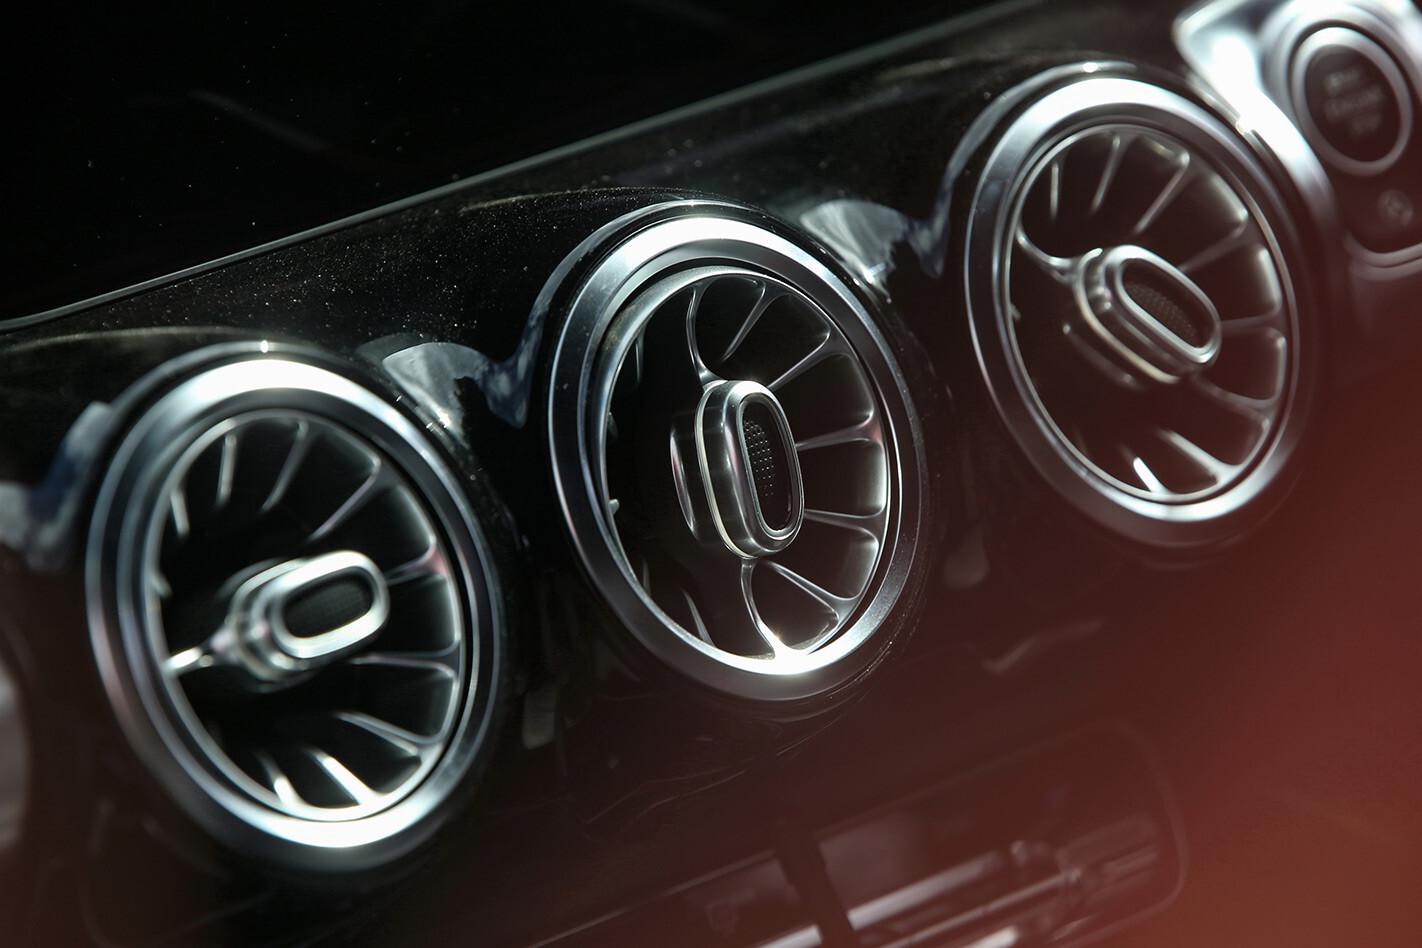 2021 Mercedes Benz GLB Air Conditioning Vents Jpg